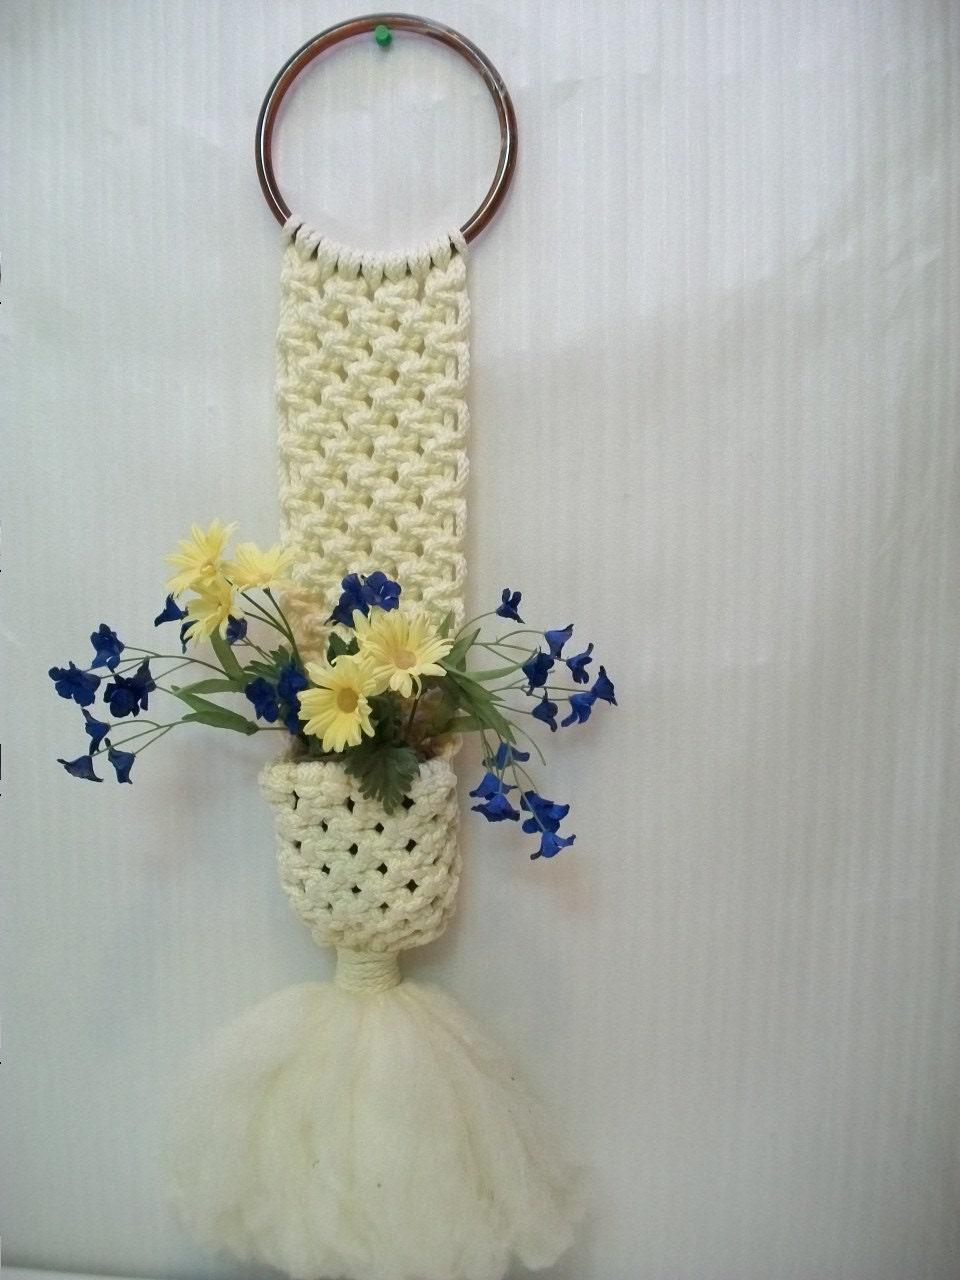 Hand Made Decorative Items. Handmade Decorative Items For Wall   Kenetiks com